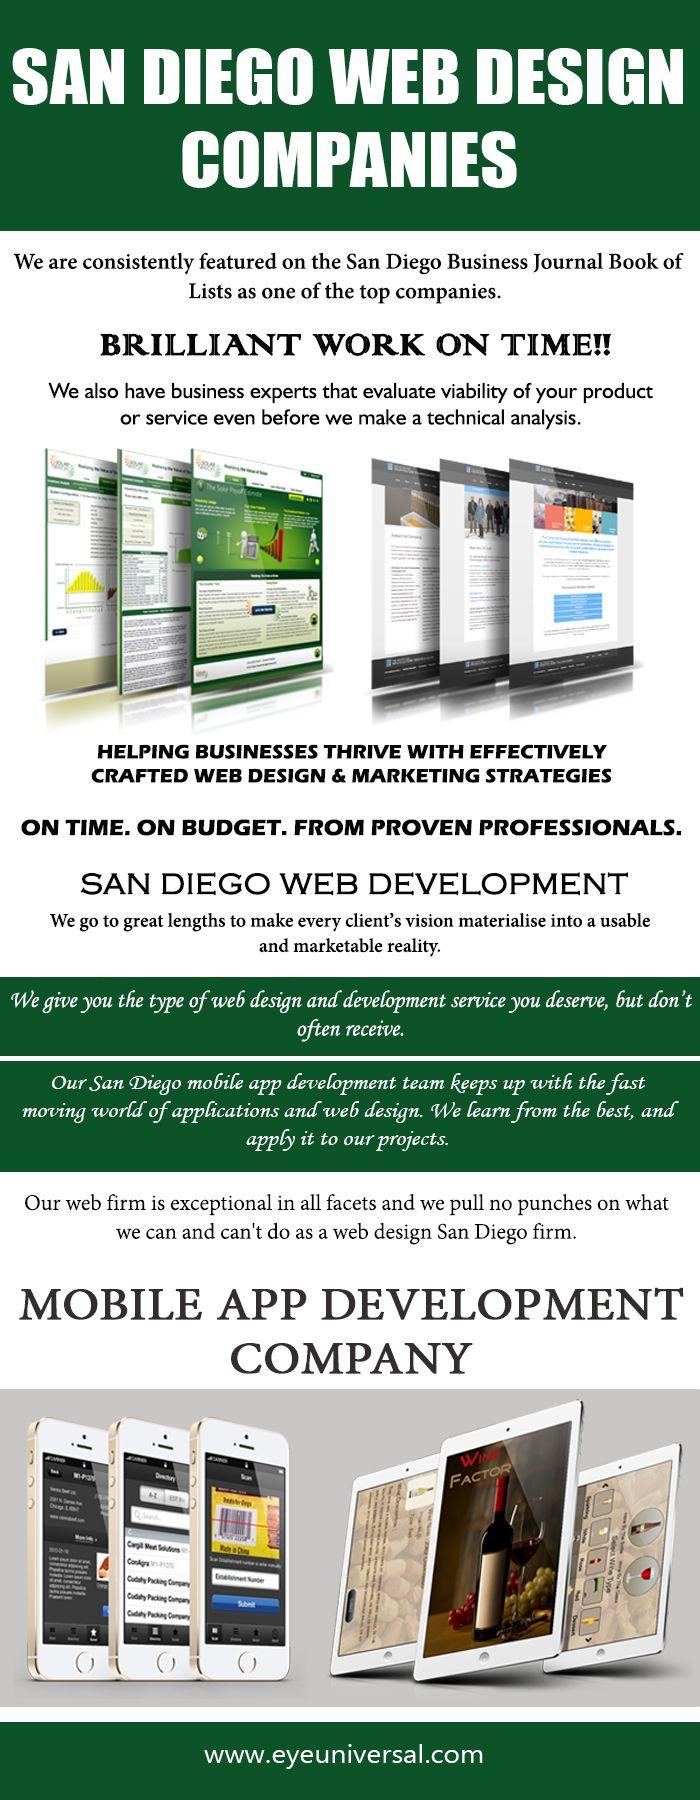 Our Website Https Www Eyeuniversal The San Go